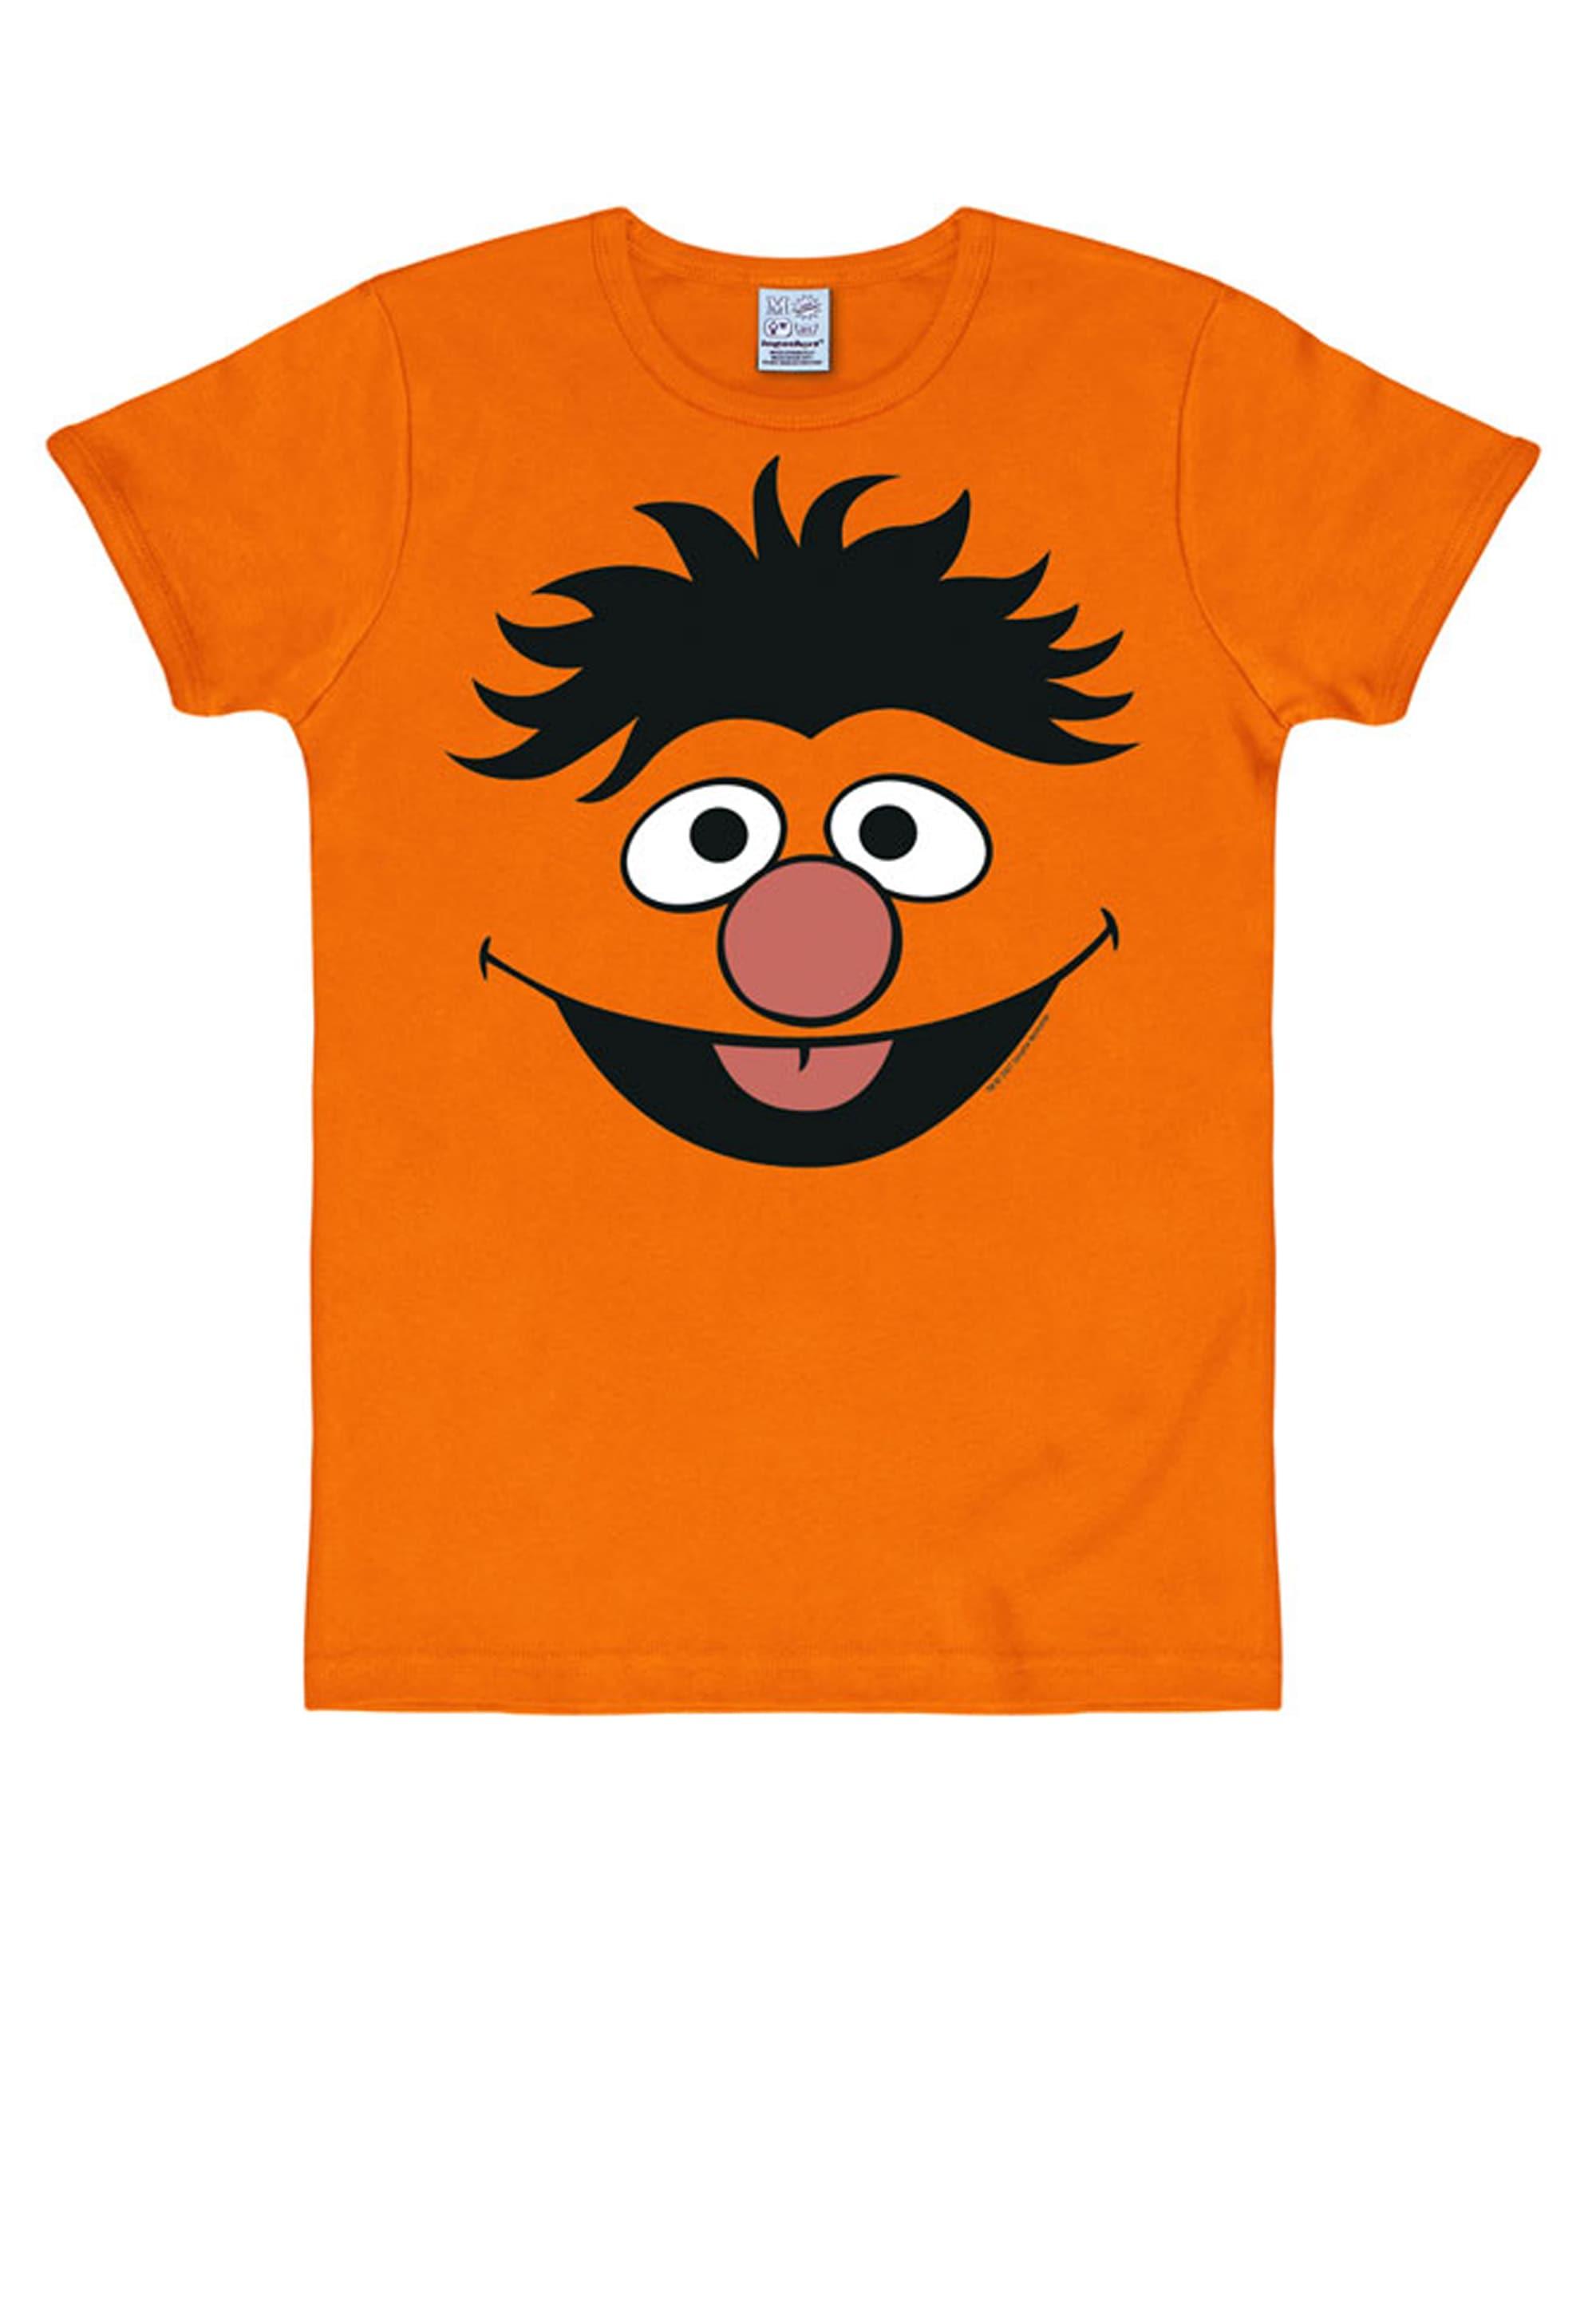 LOGOSHIRT T-Shirt mit witzigem Motiv Ernie Herrenmode/Große Größen/Shirts